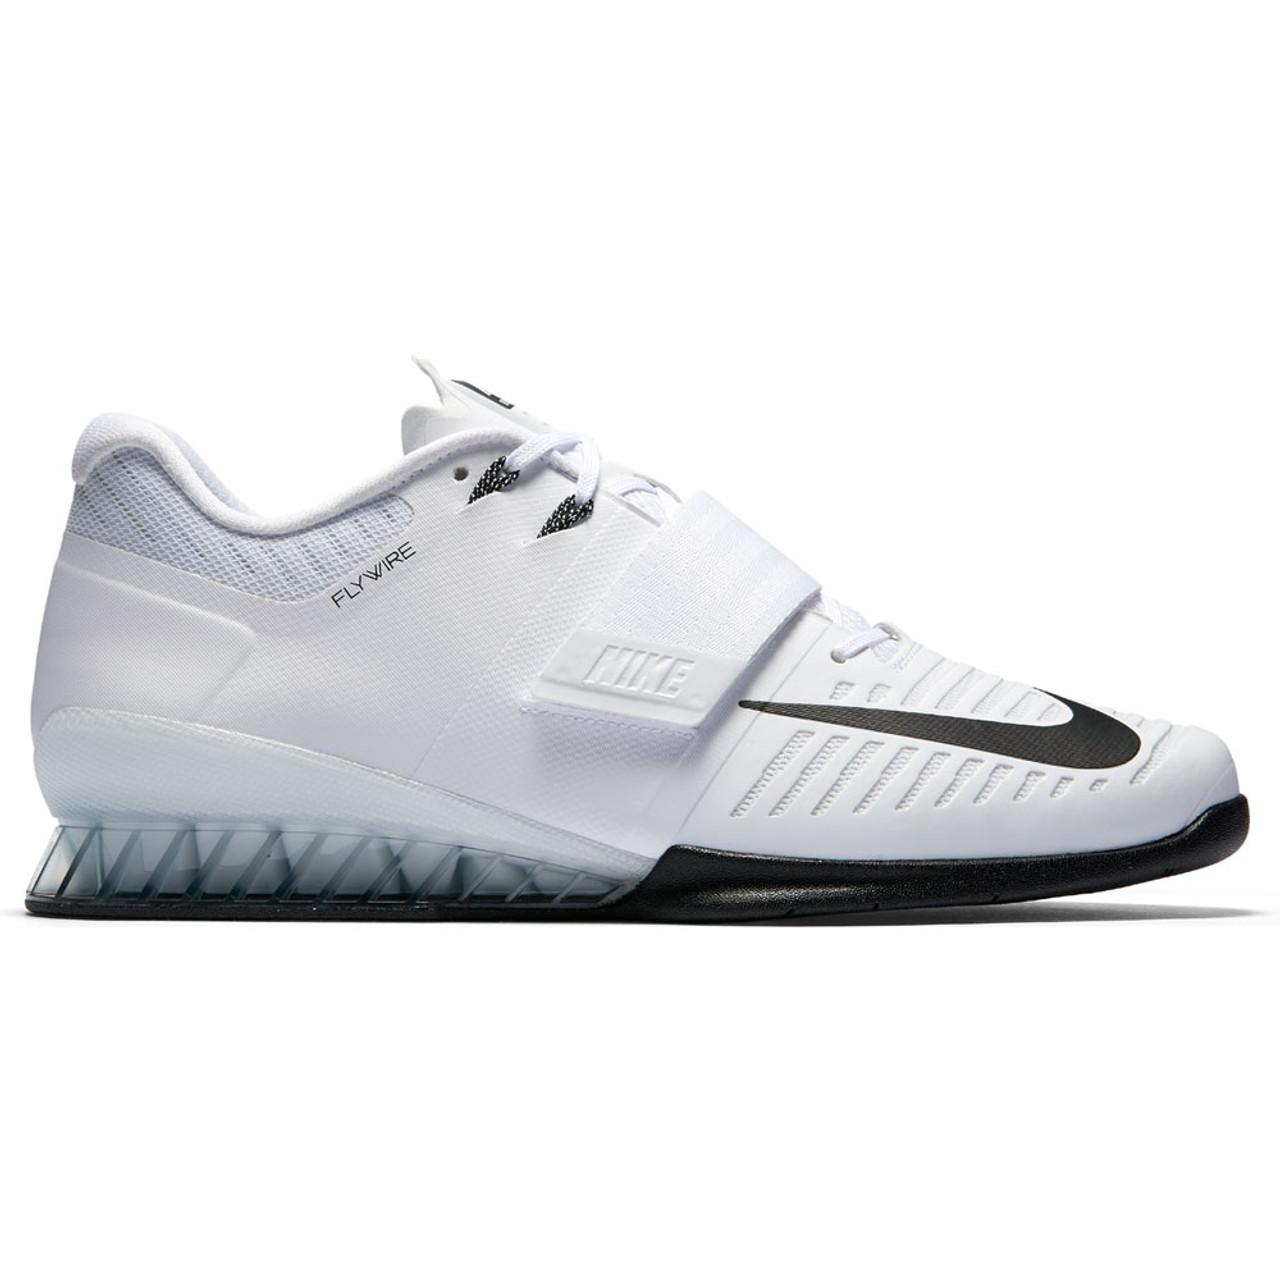 anchura A la meditación Incorrecto  Nike Romaleos 3 Weightlifting Shoes (Multiple Colors)